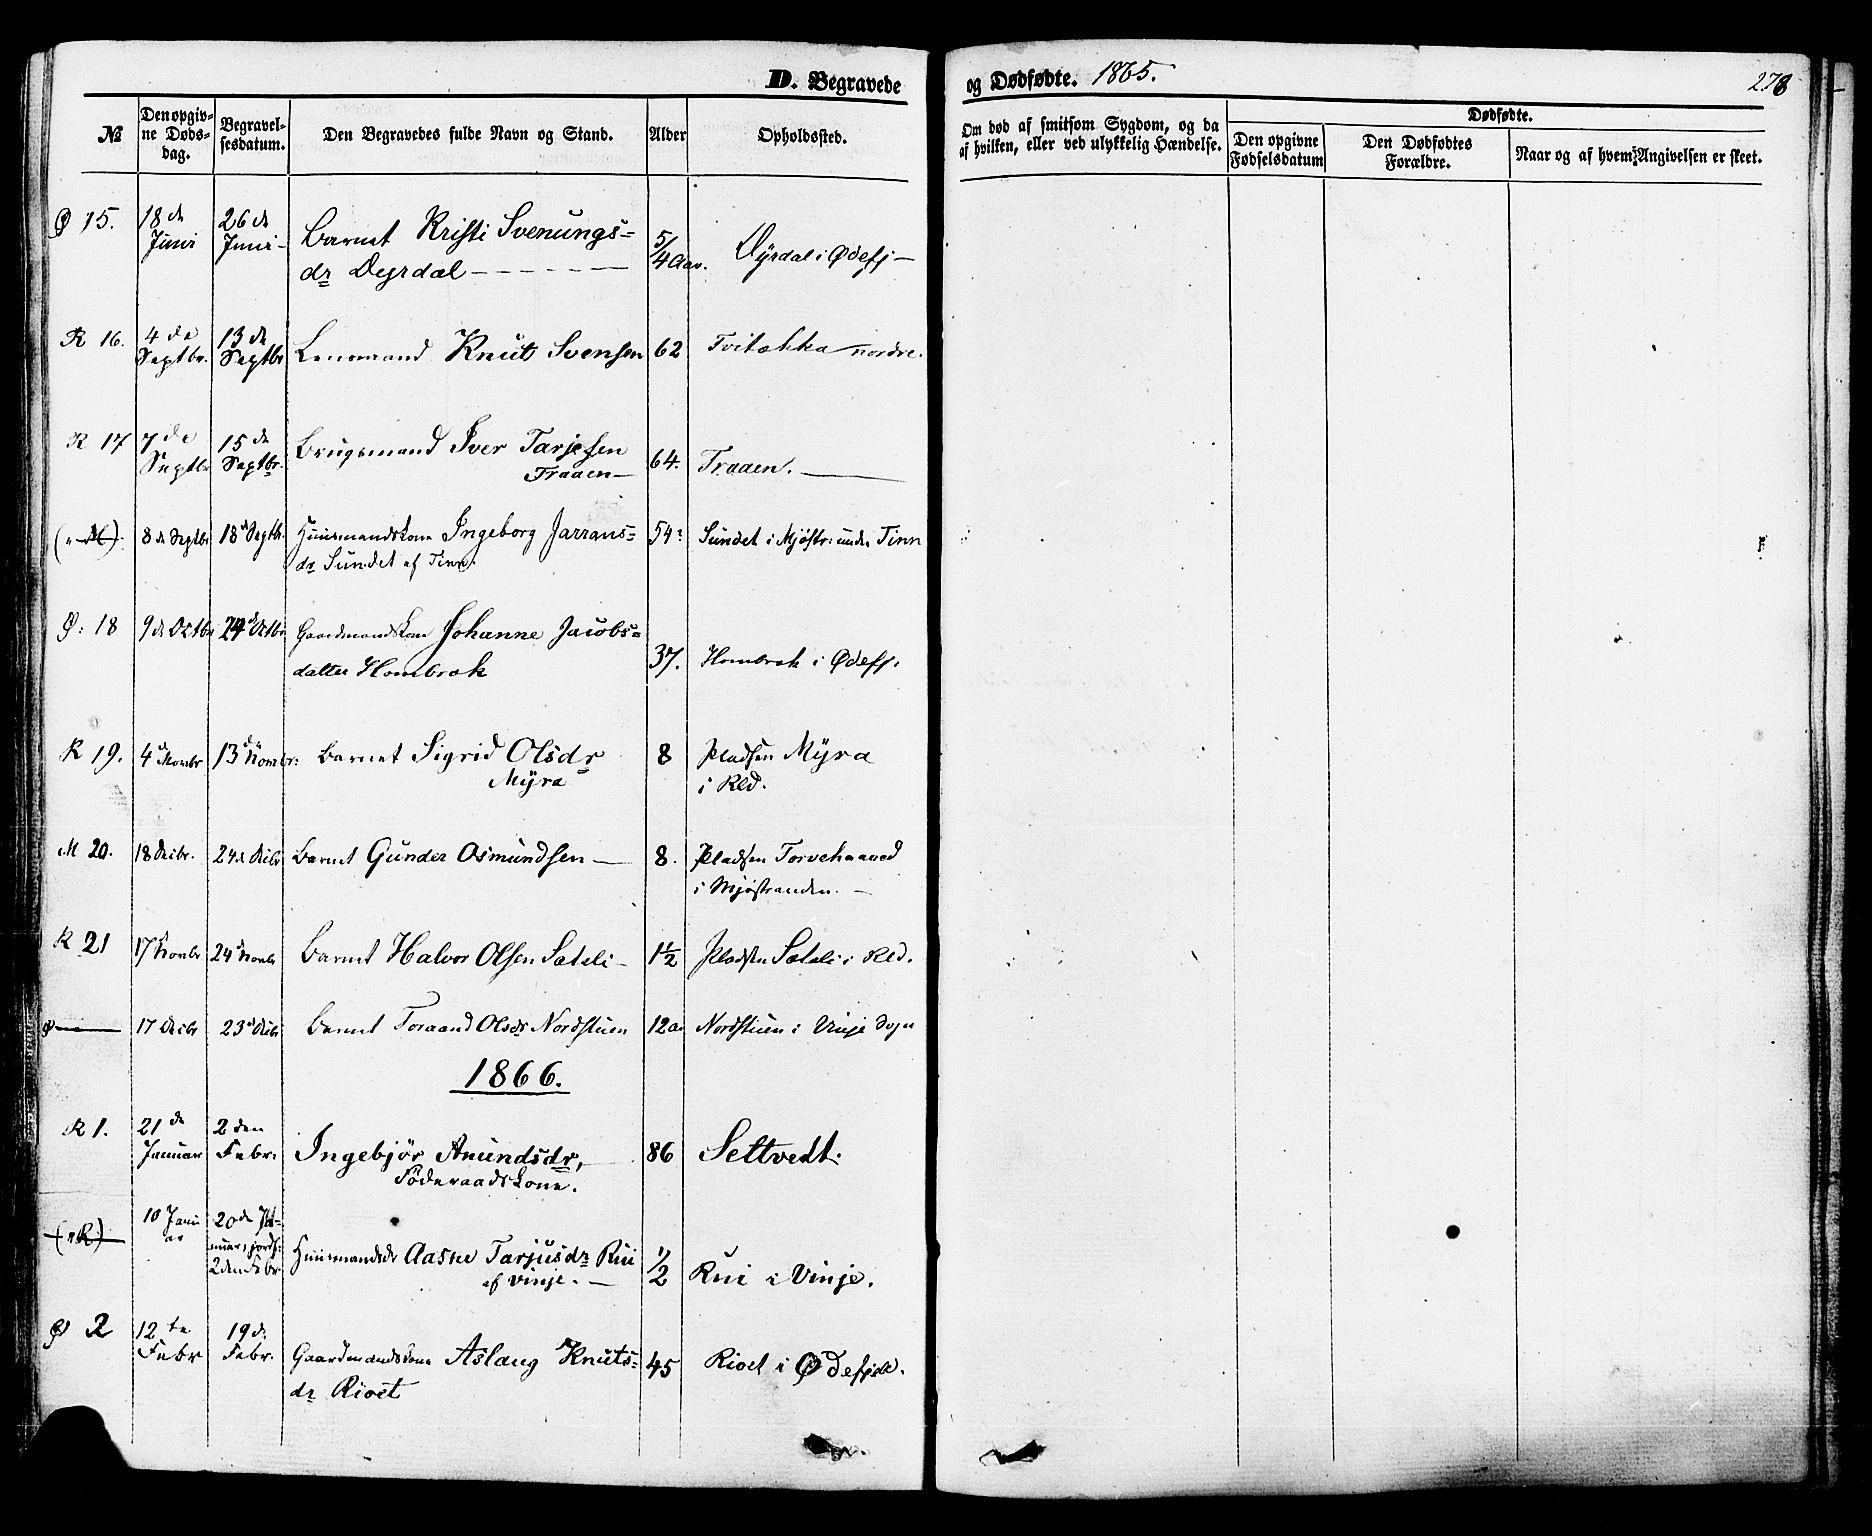 SAKO, Rauland kirkebøker, F/Fa/L0003: Ministerialbok nr. 3, 1859-1886, s. 278